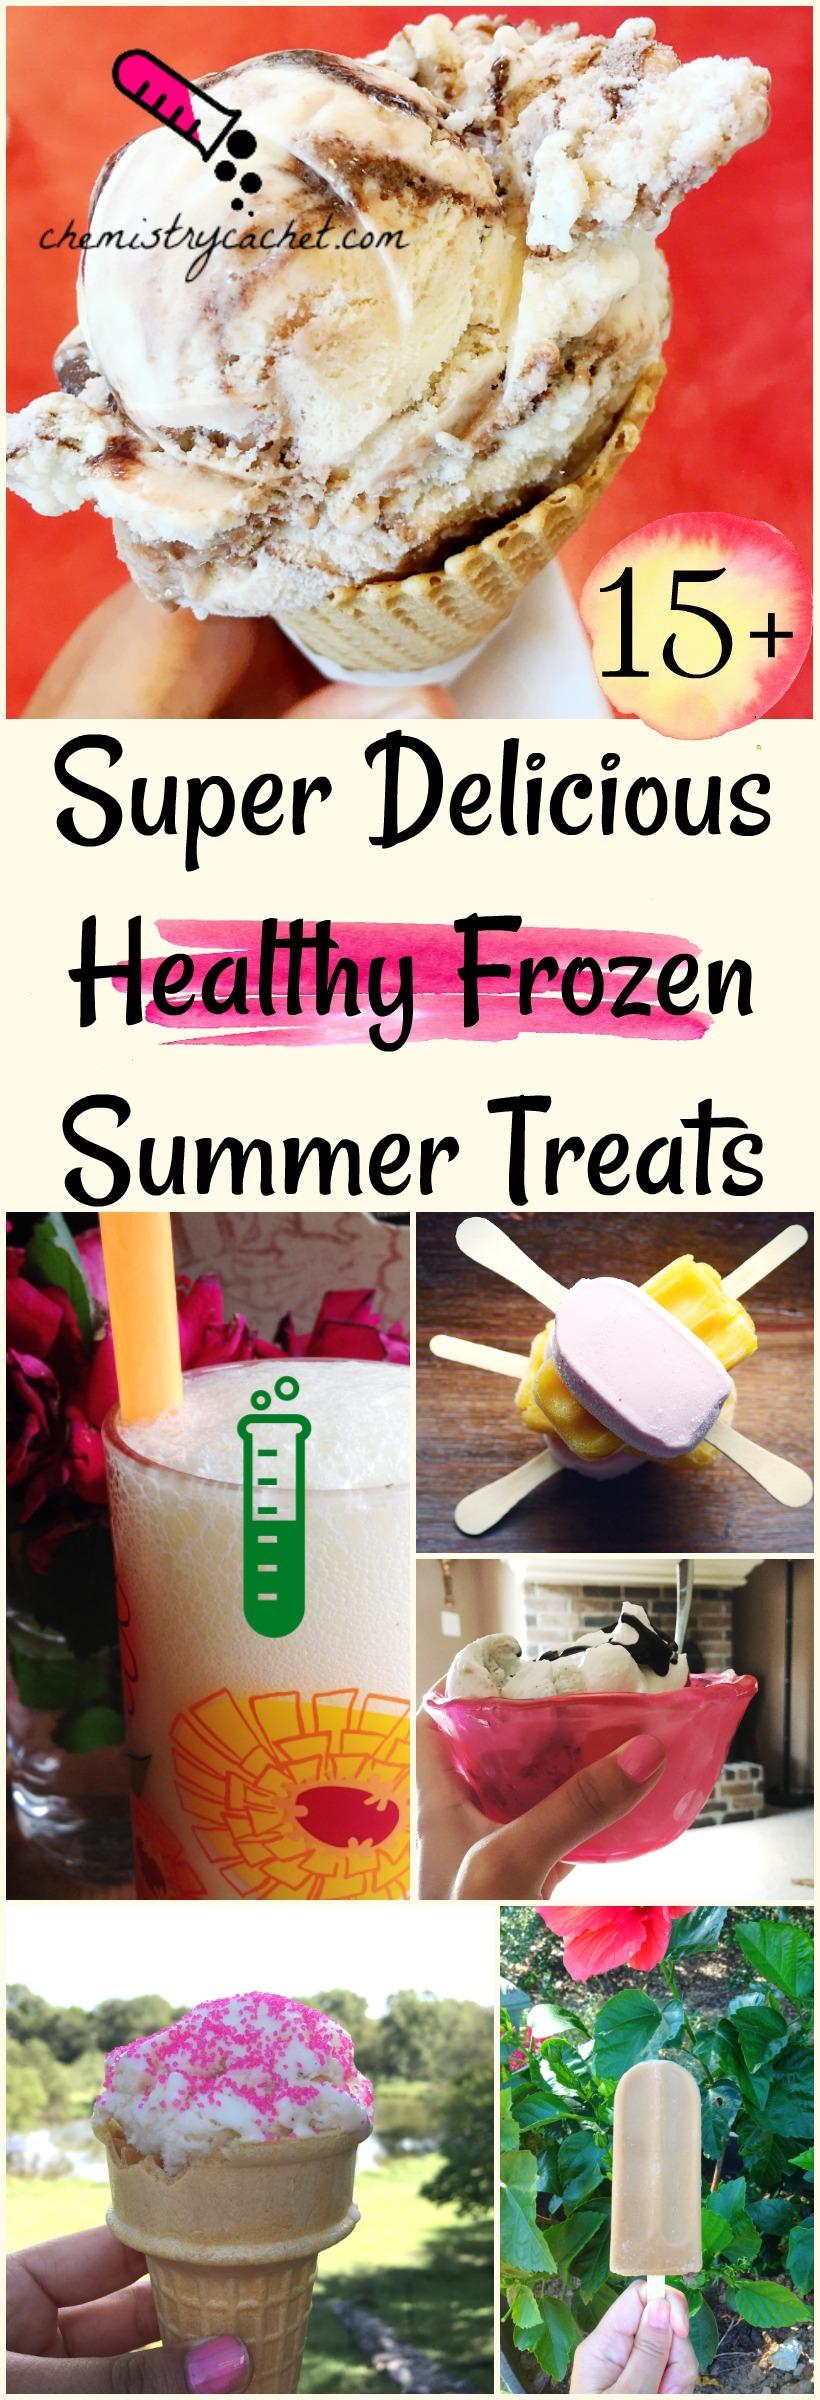 15+ Super Delicious & Healthy Frozen Summer Treats on chemistrycachet.com